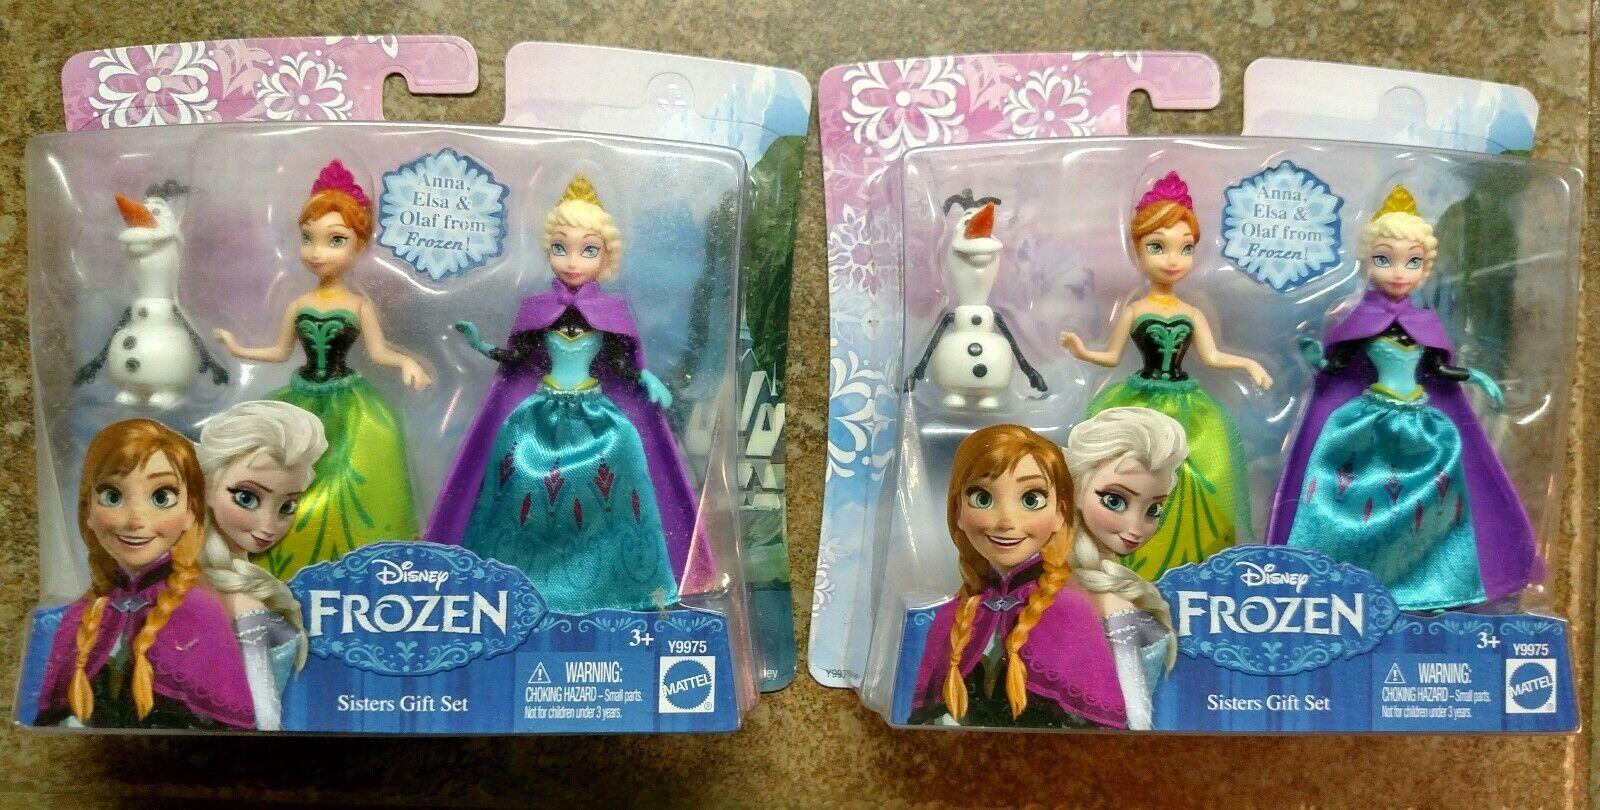 2 Walt Disney 2013 Frozen Sister Gift Sets Princess Elsa Anna Olaf toy figures